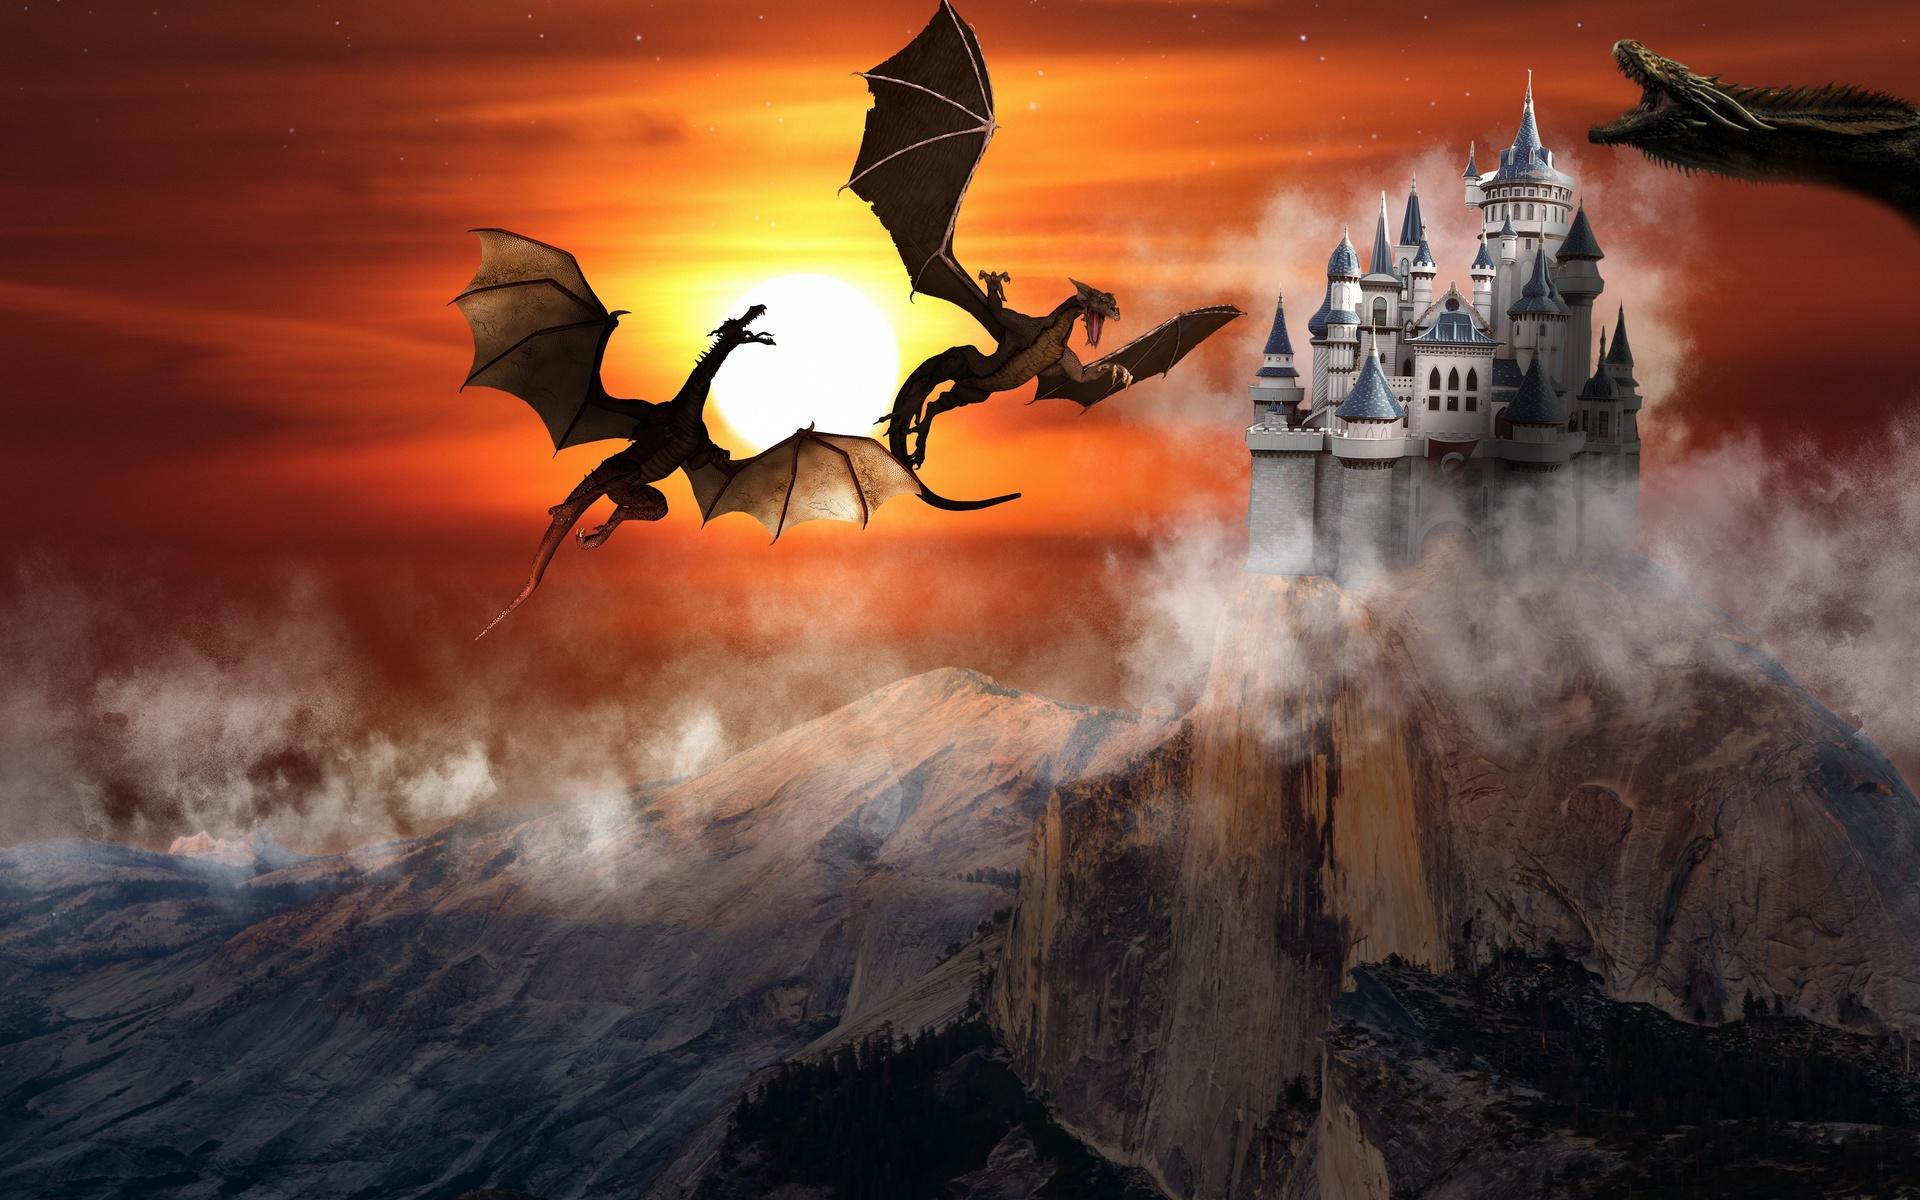 картинка дракон над замком нет